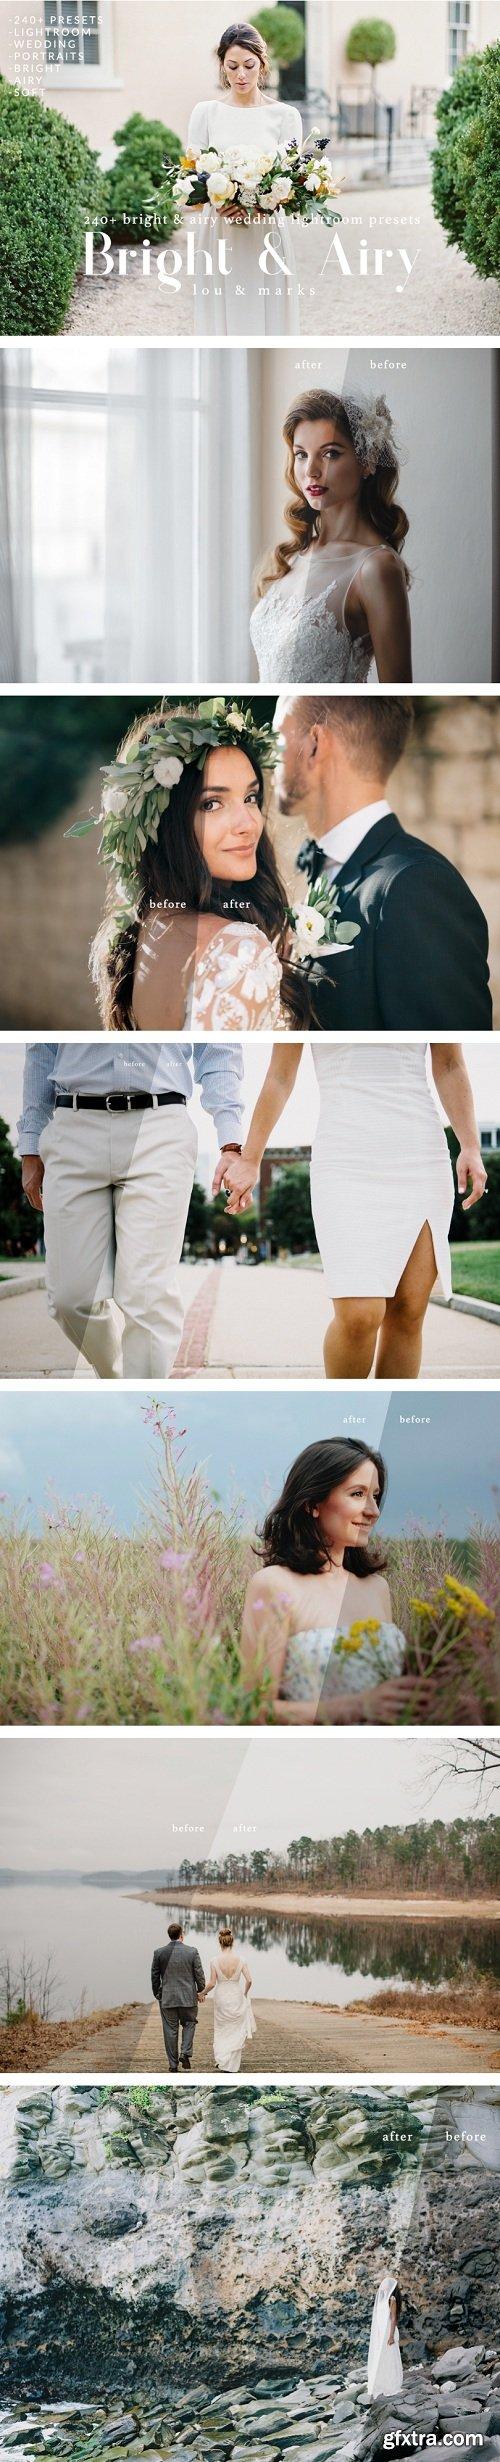 Bright & Airy Wedding Lightroom Kit